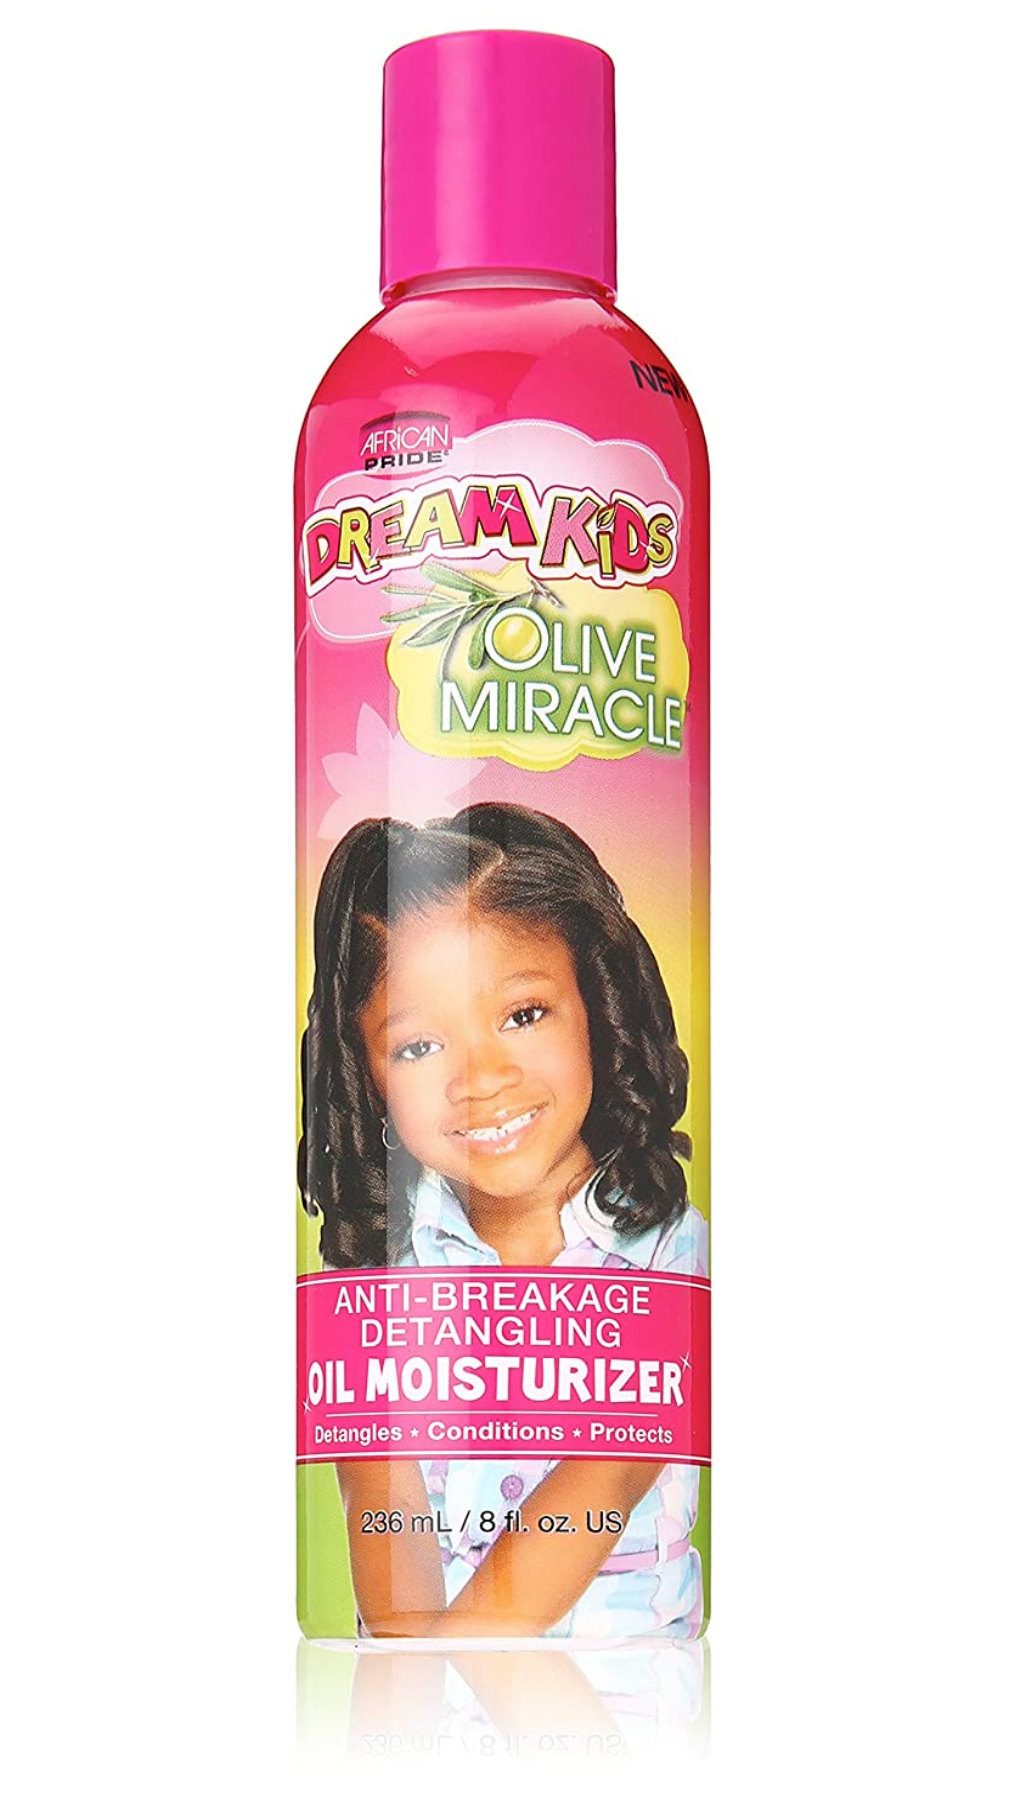 Dream Kids Olive Miracle Oil Moisurizer 8 Oz